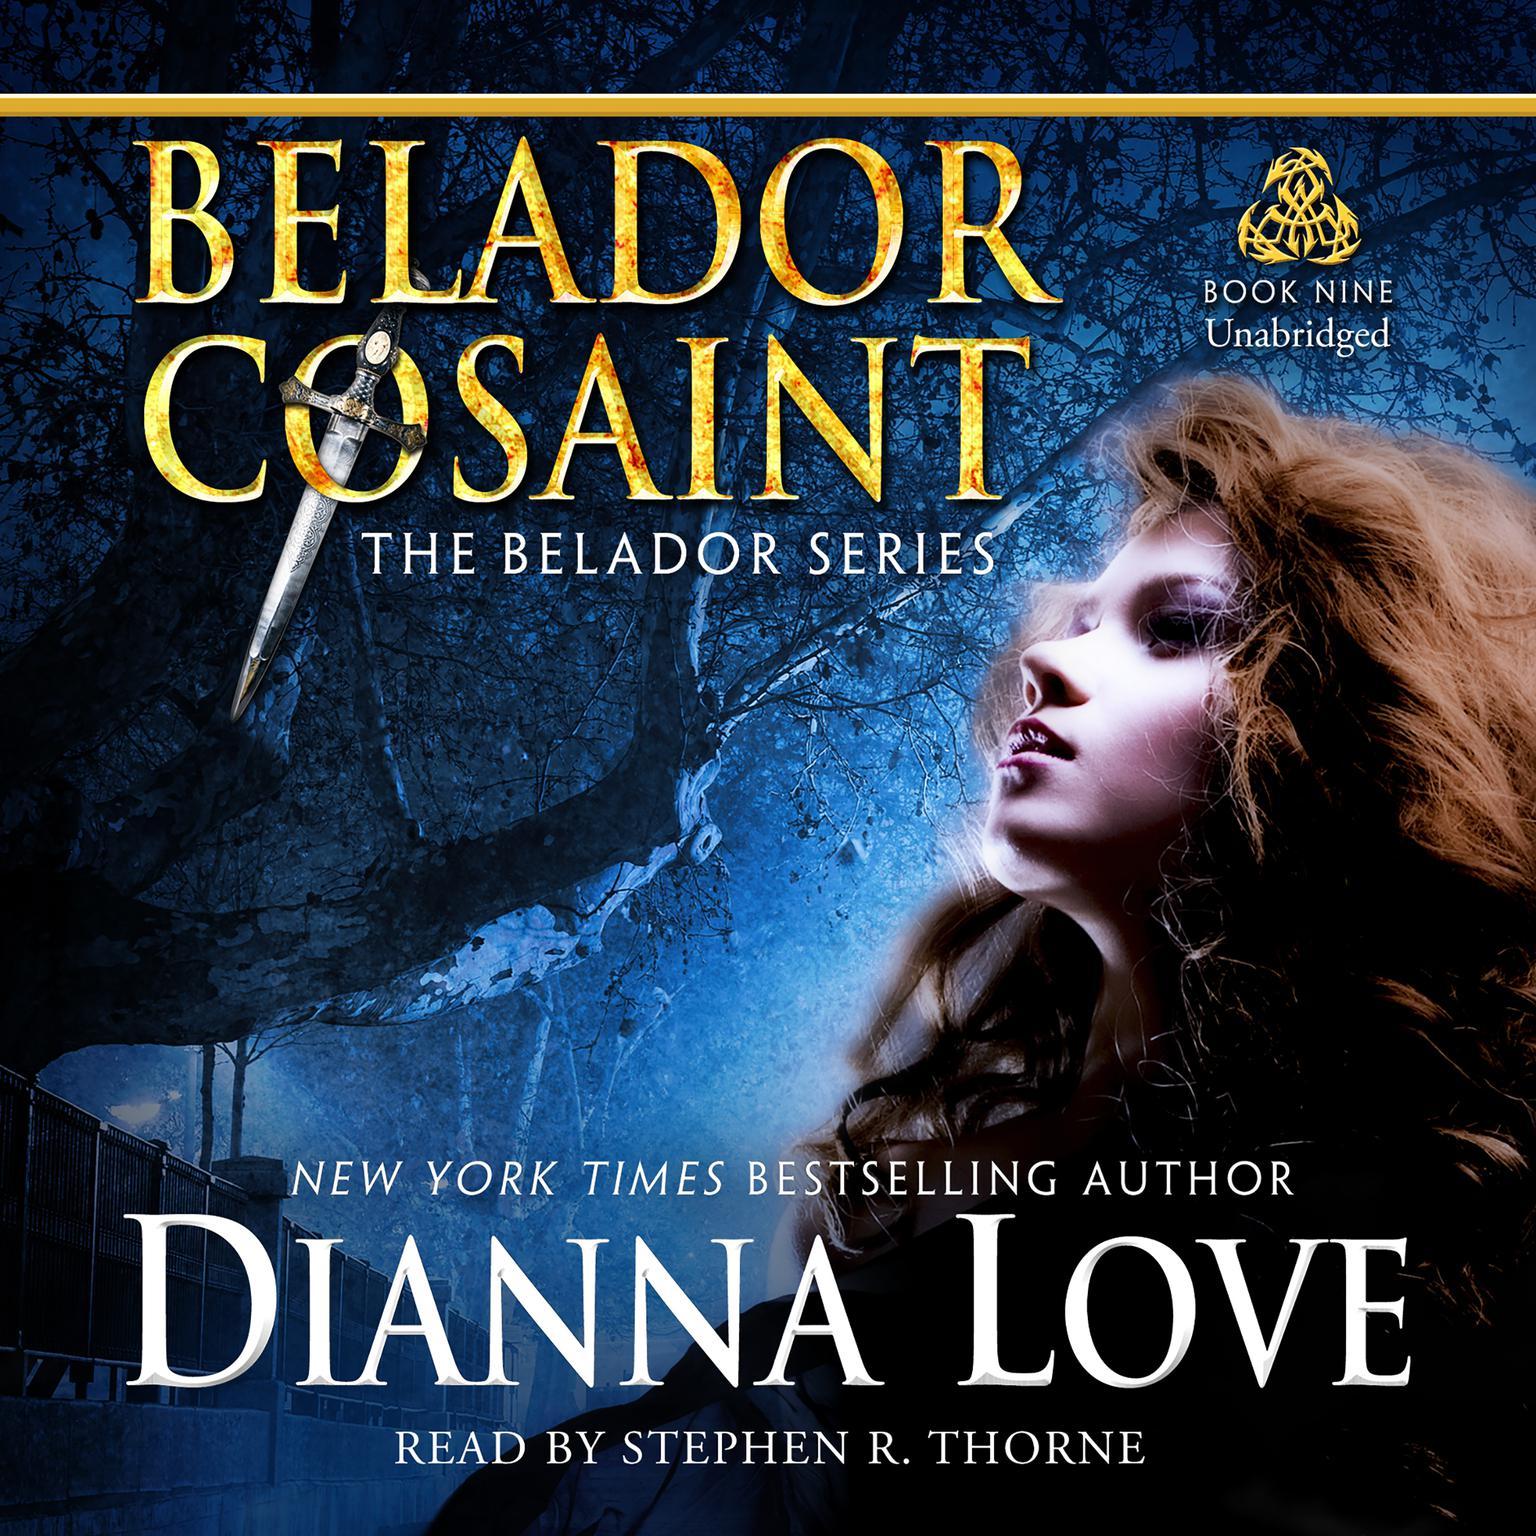 Belador Cosaint Audiobook, by Dianna Love